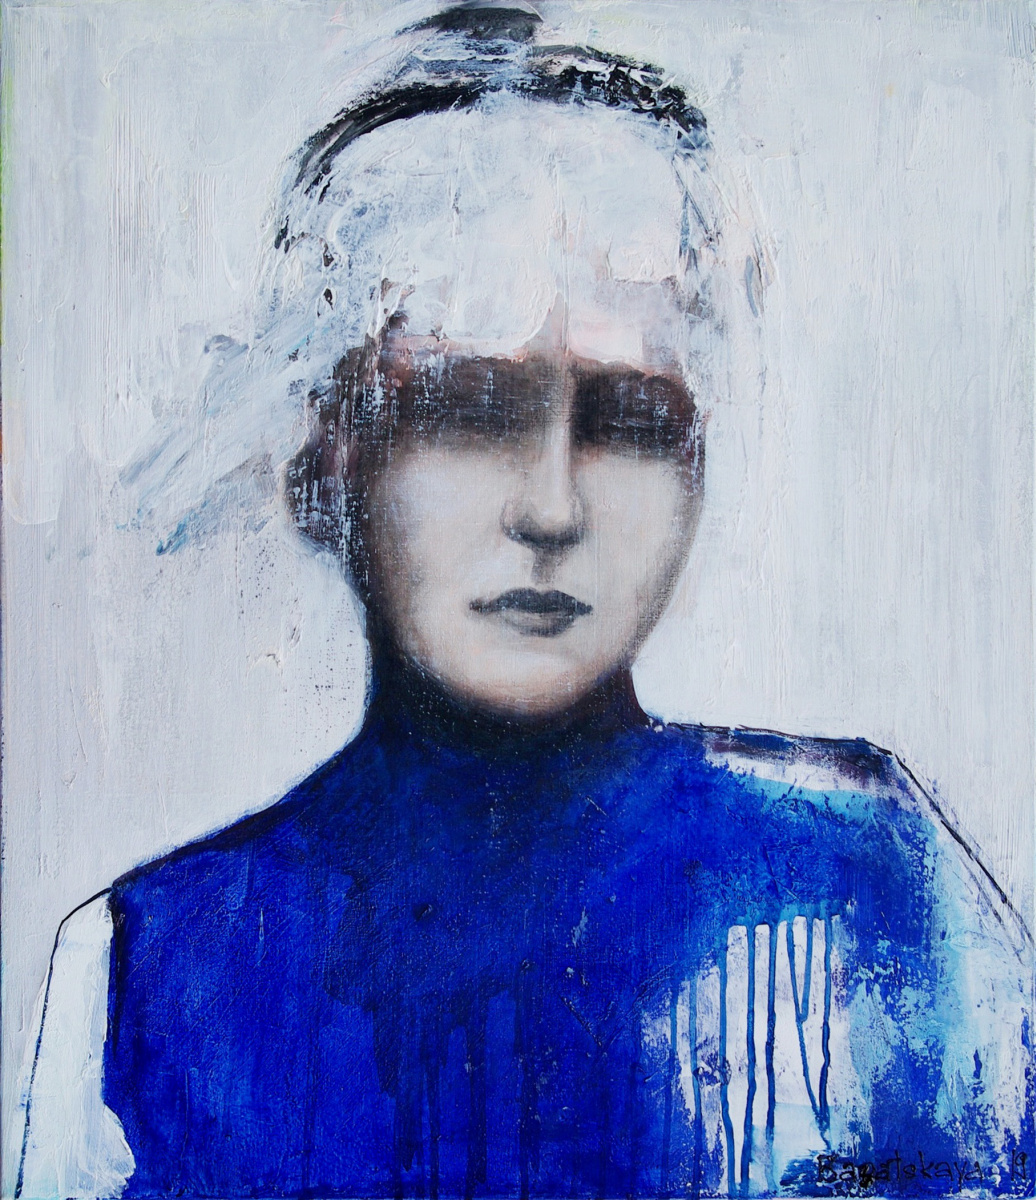 Natalia Bagatskaya. Portrait of a Stranger 3